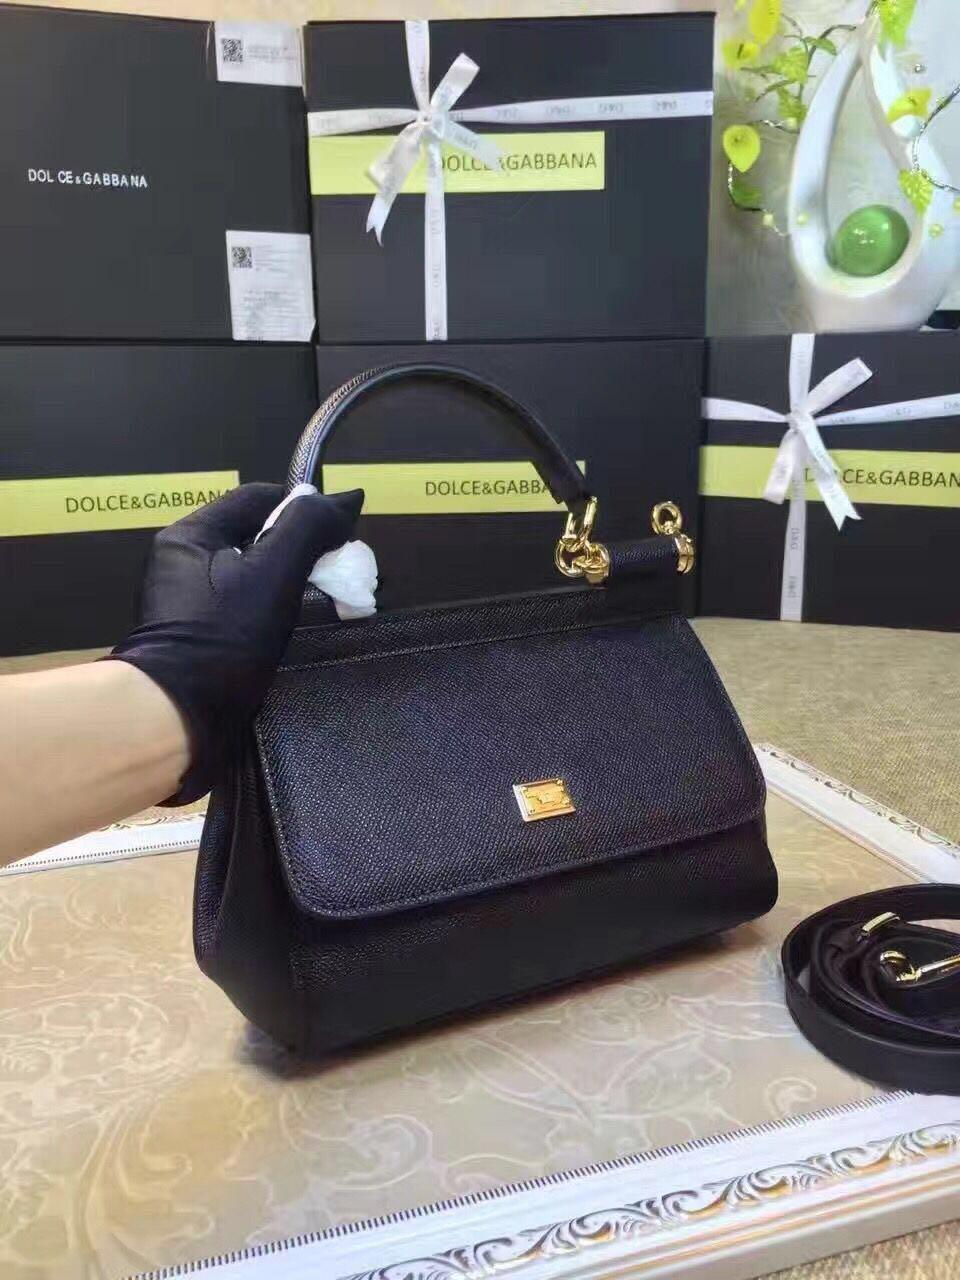 Dolce & Gabbana SICILY Calfskin Tote Bag BB4137 Black